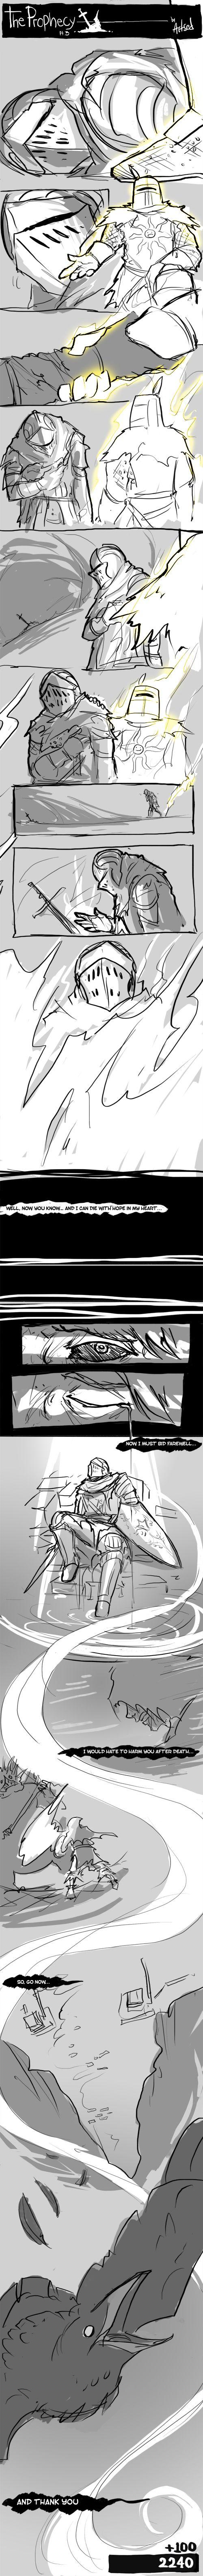 Dark Souls - The Prophecy - pt 3